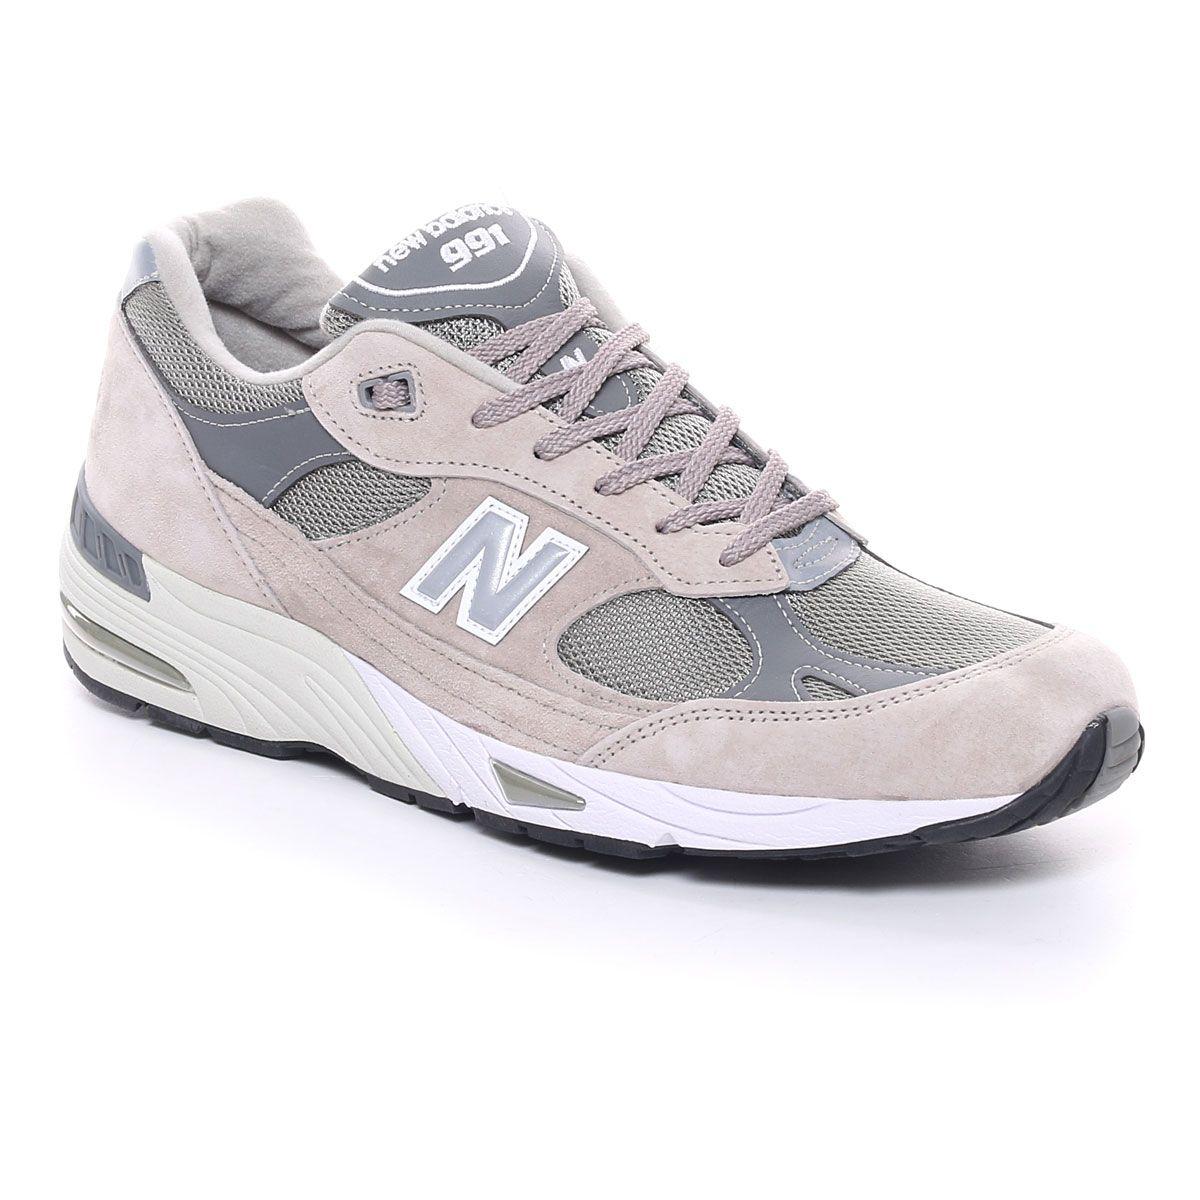 New Balance Shop Online - NonSoloSport